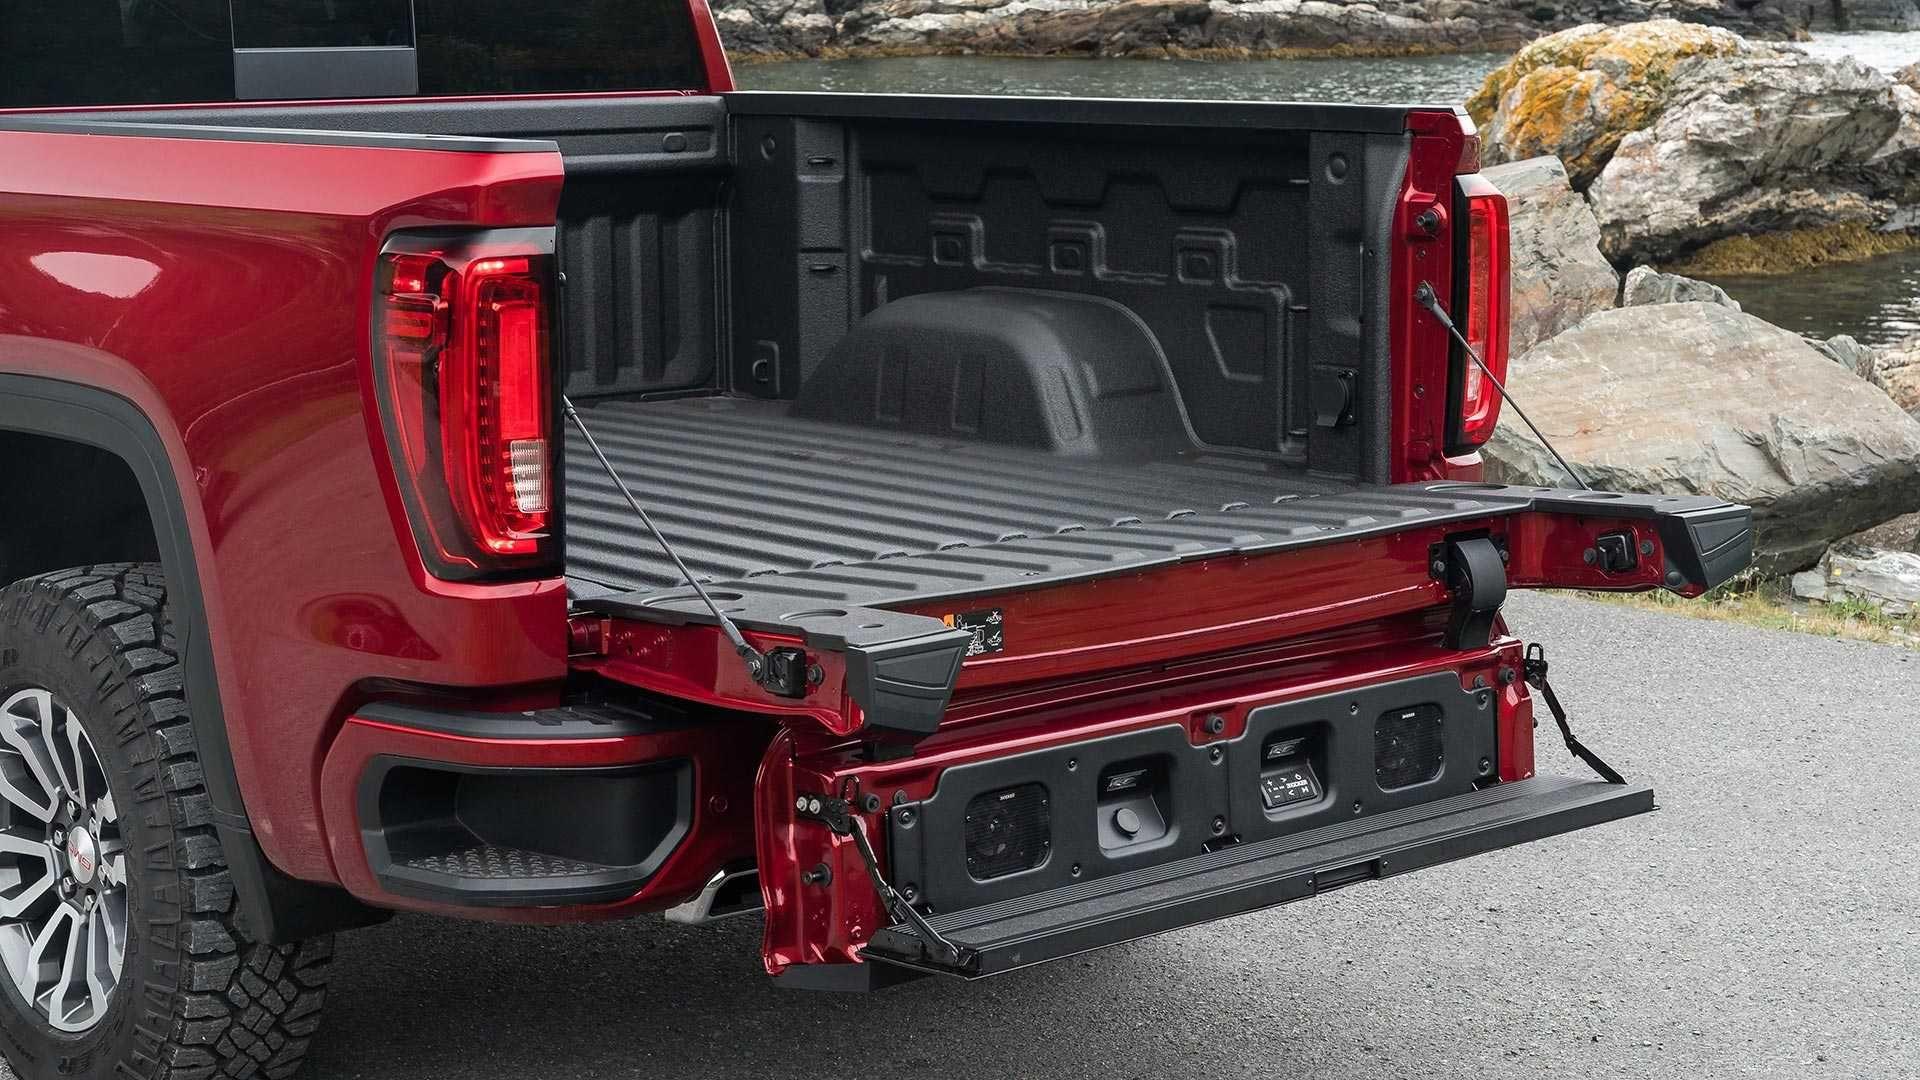 New Gmc Sierra At4 Off Road Performance Package Gmc Sierra Gmc